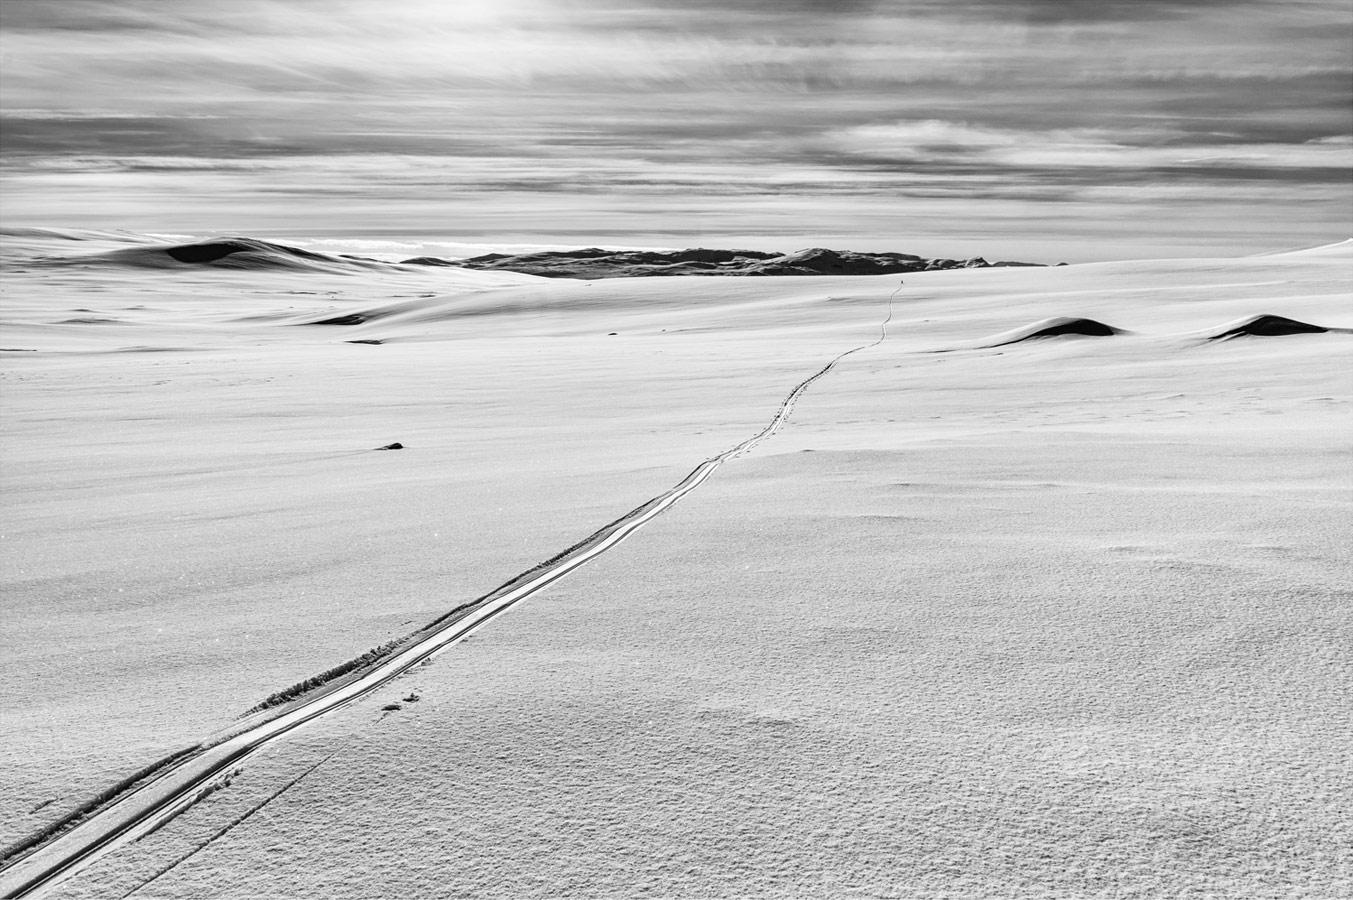 Дэвид Вранборд / David Wrangbord, Финалист конкурса, Фотоконкурс CVCEPhoto